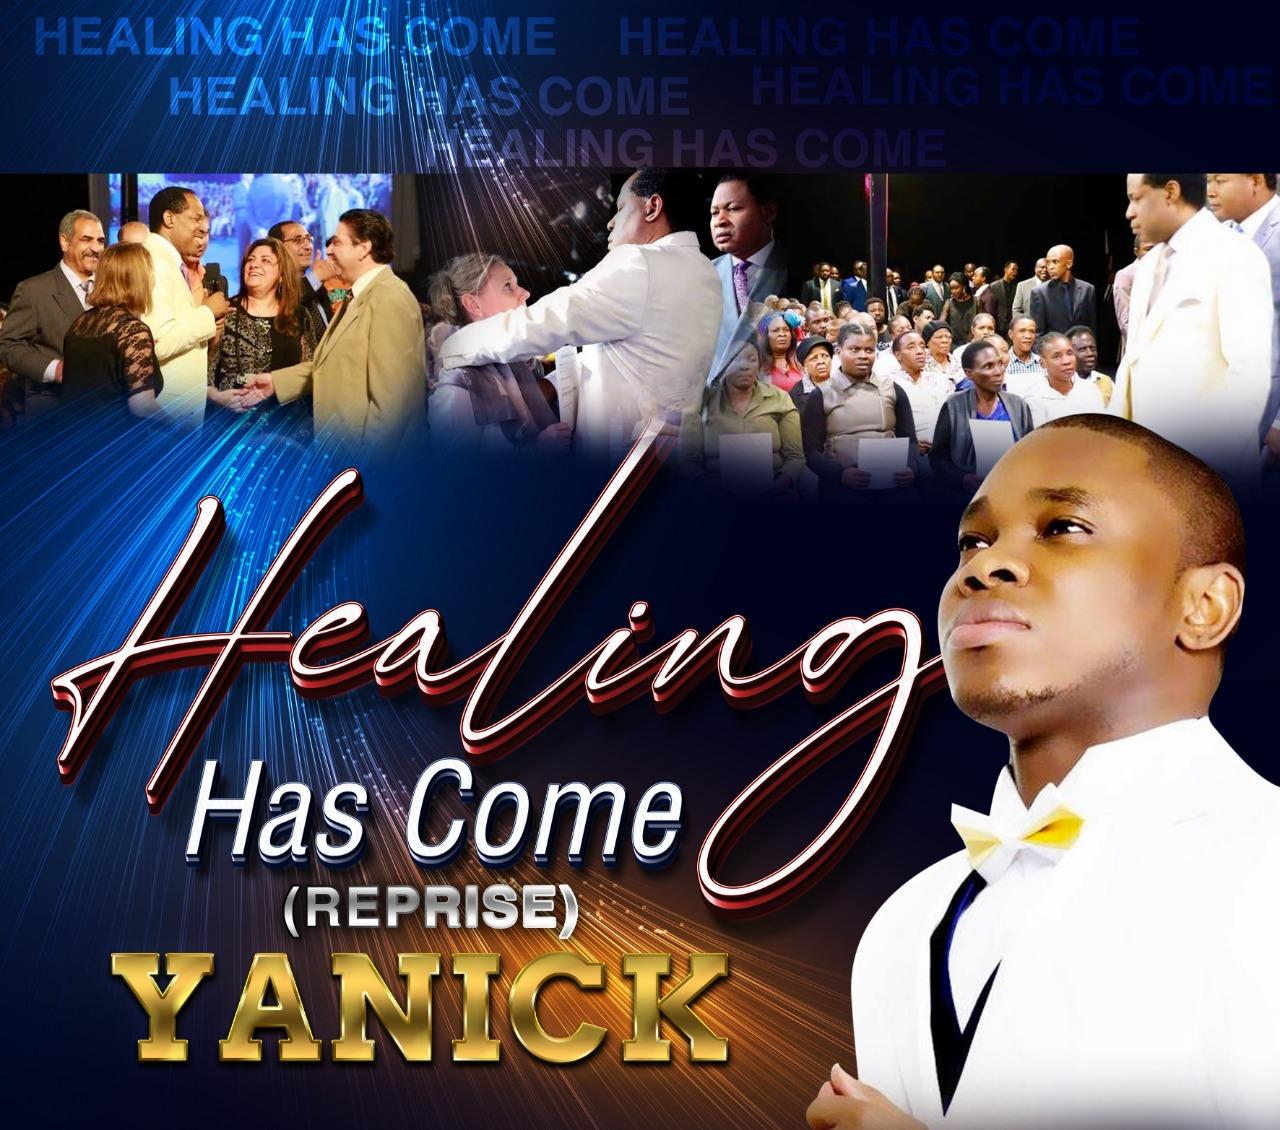 Download Mp3 : Healing Has Come (Reprise) - Pastor Dr. Yanick